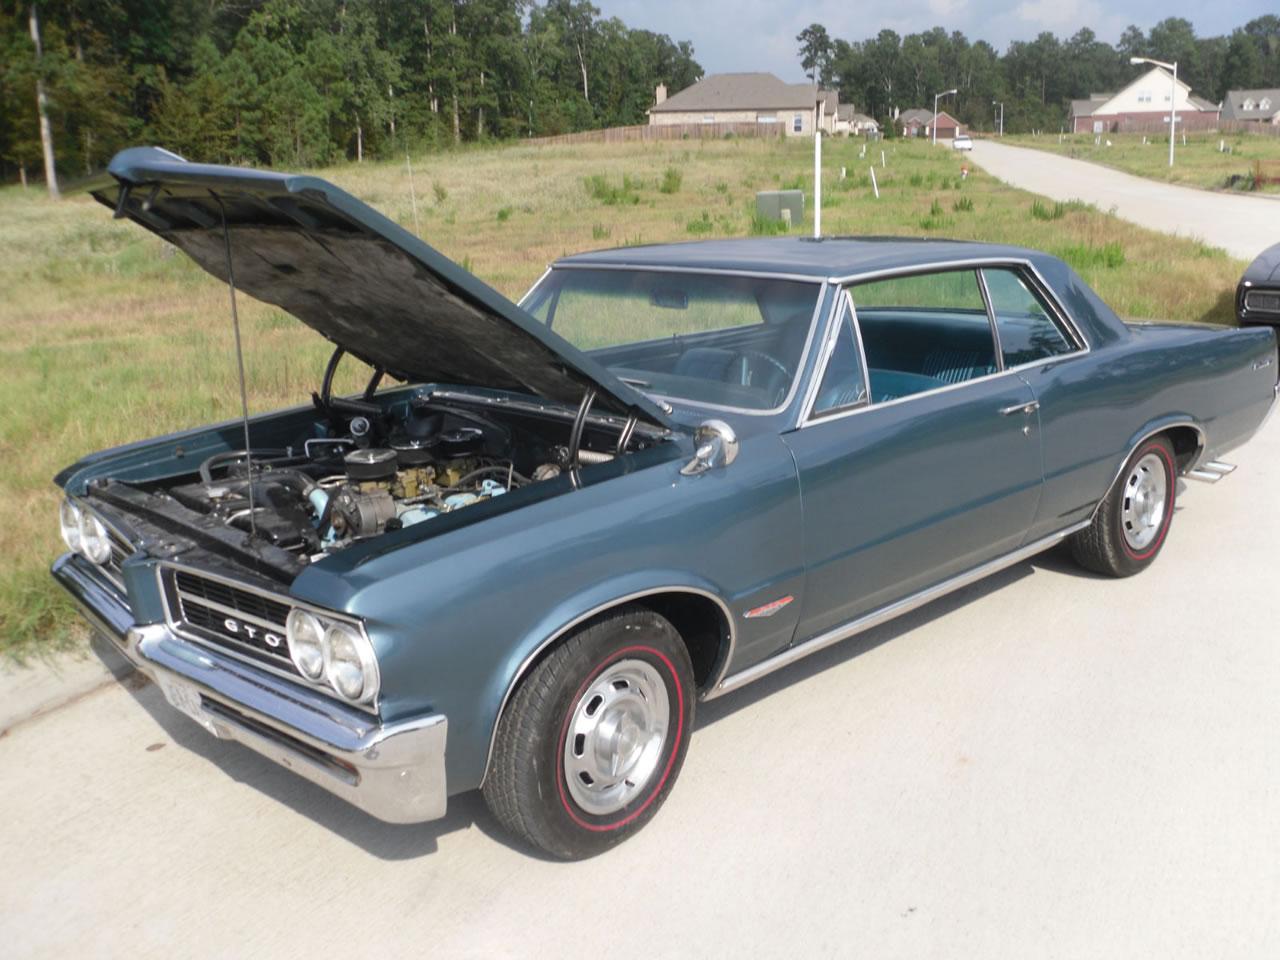 Car Inspection Houston >> 1964 GTO Pontiac Hardtop 389 Tri-Power For Sale